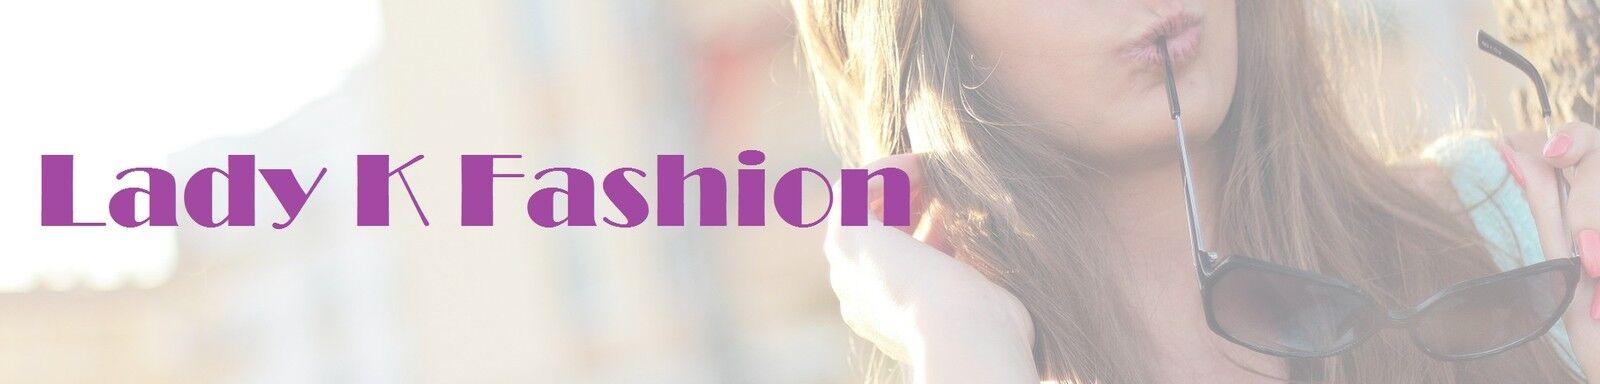 FashionLadyK